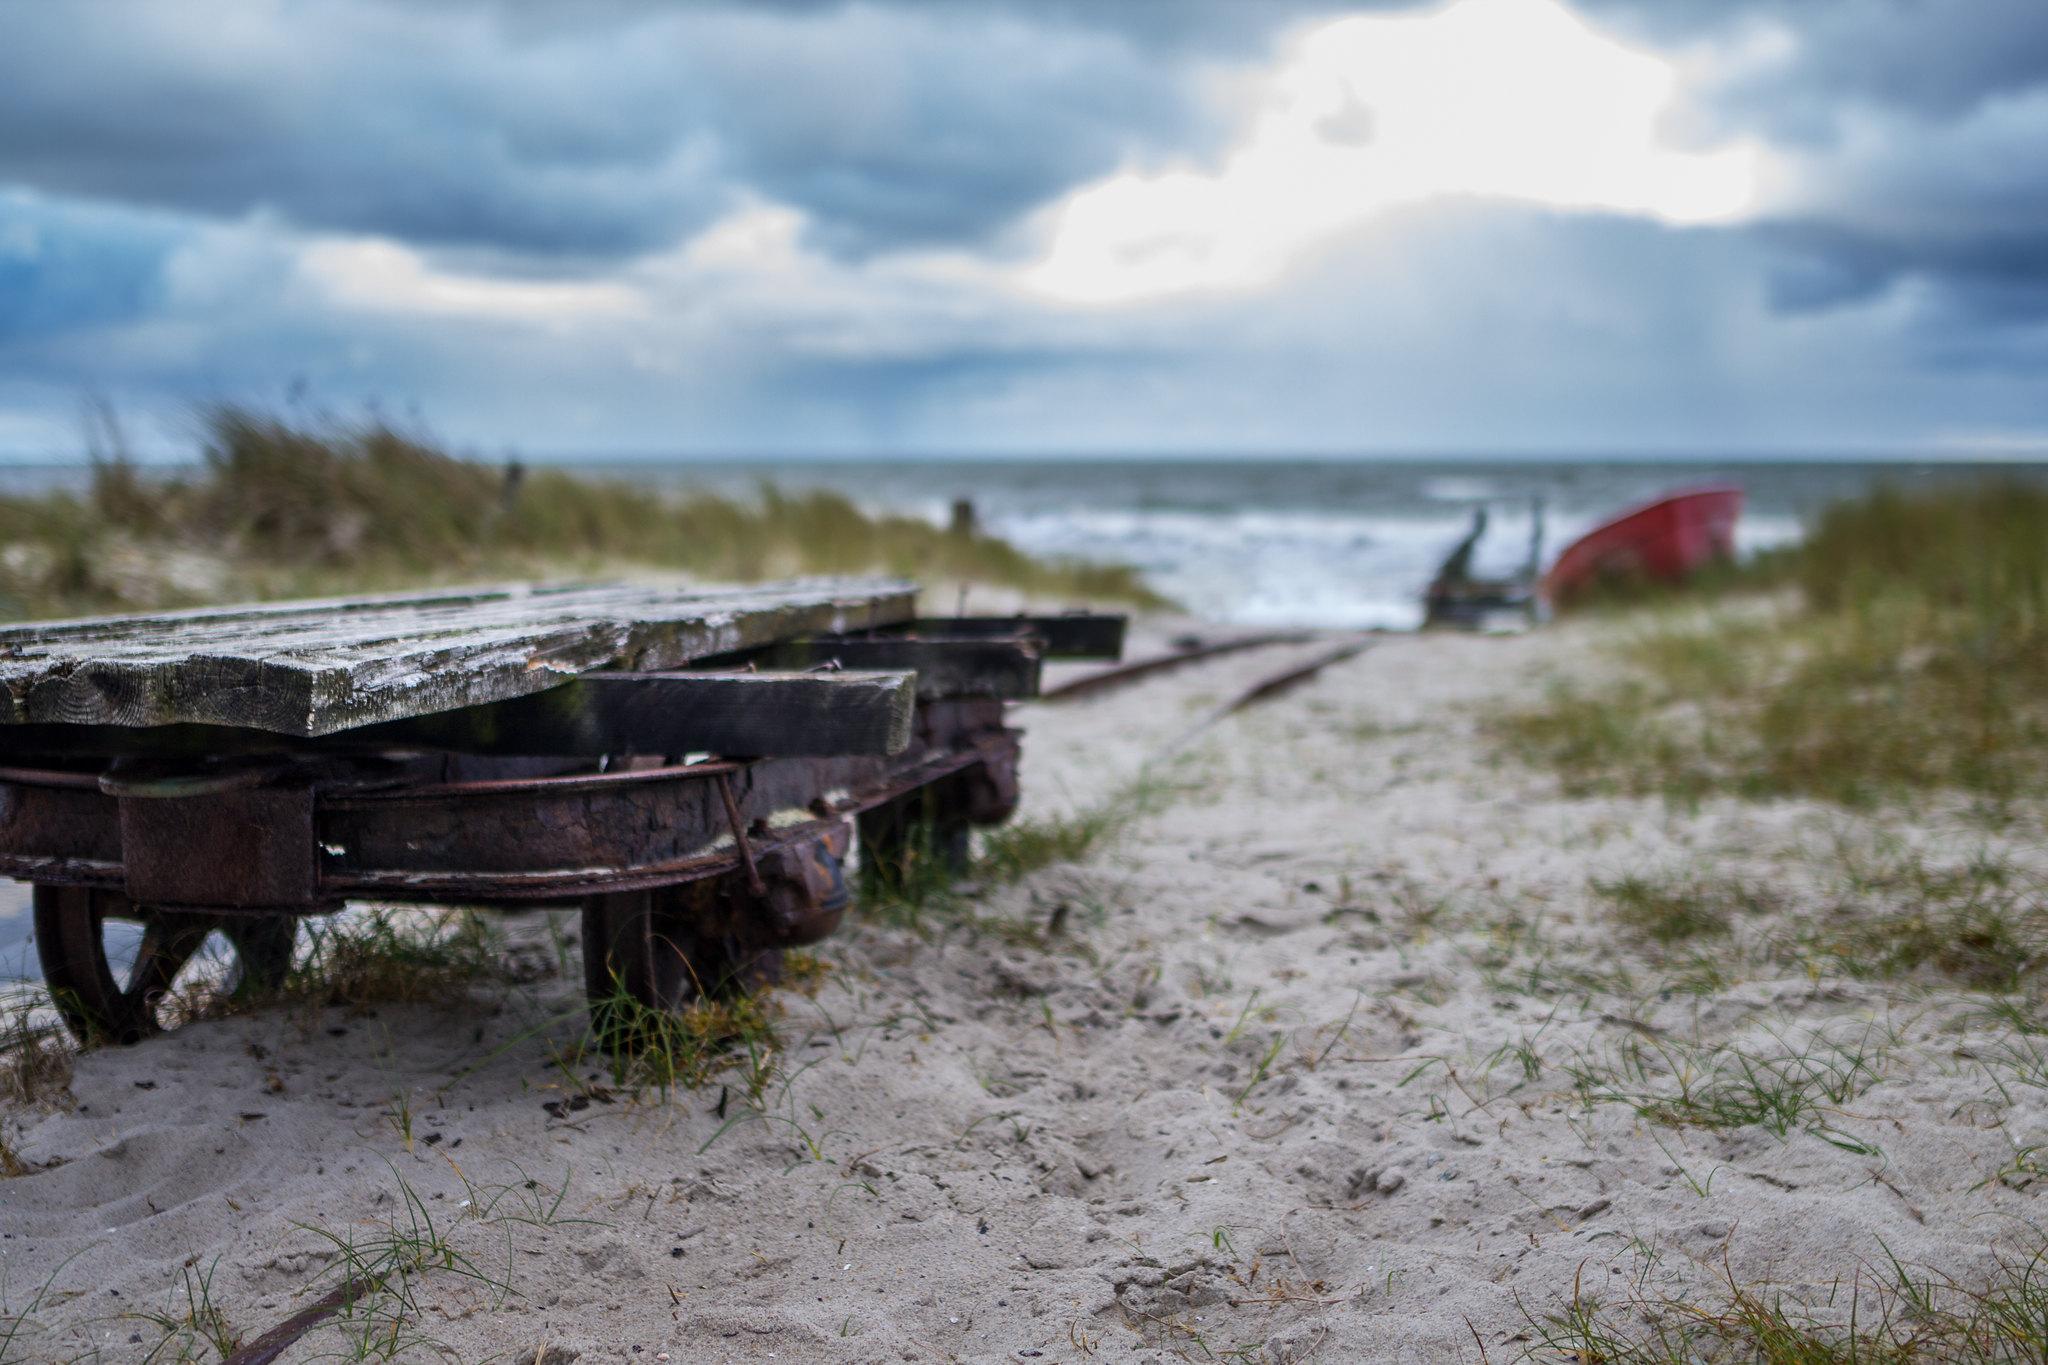 Railway into the sea